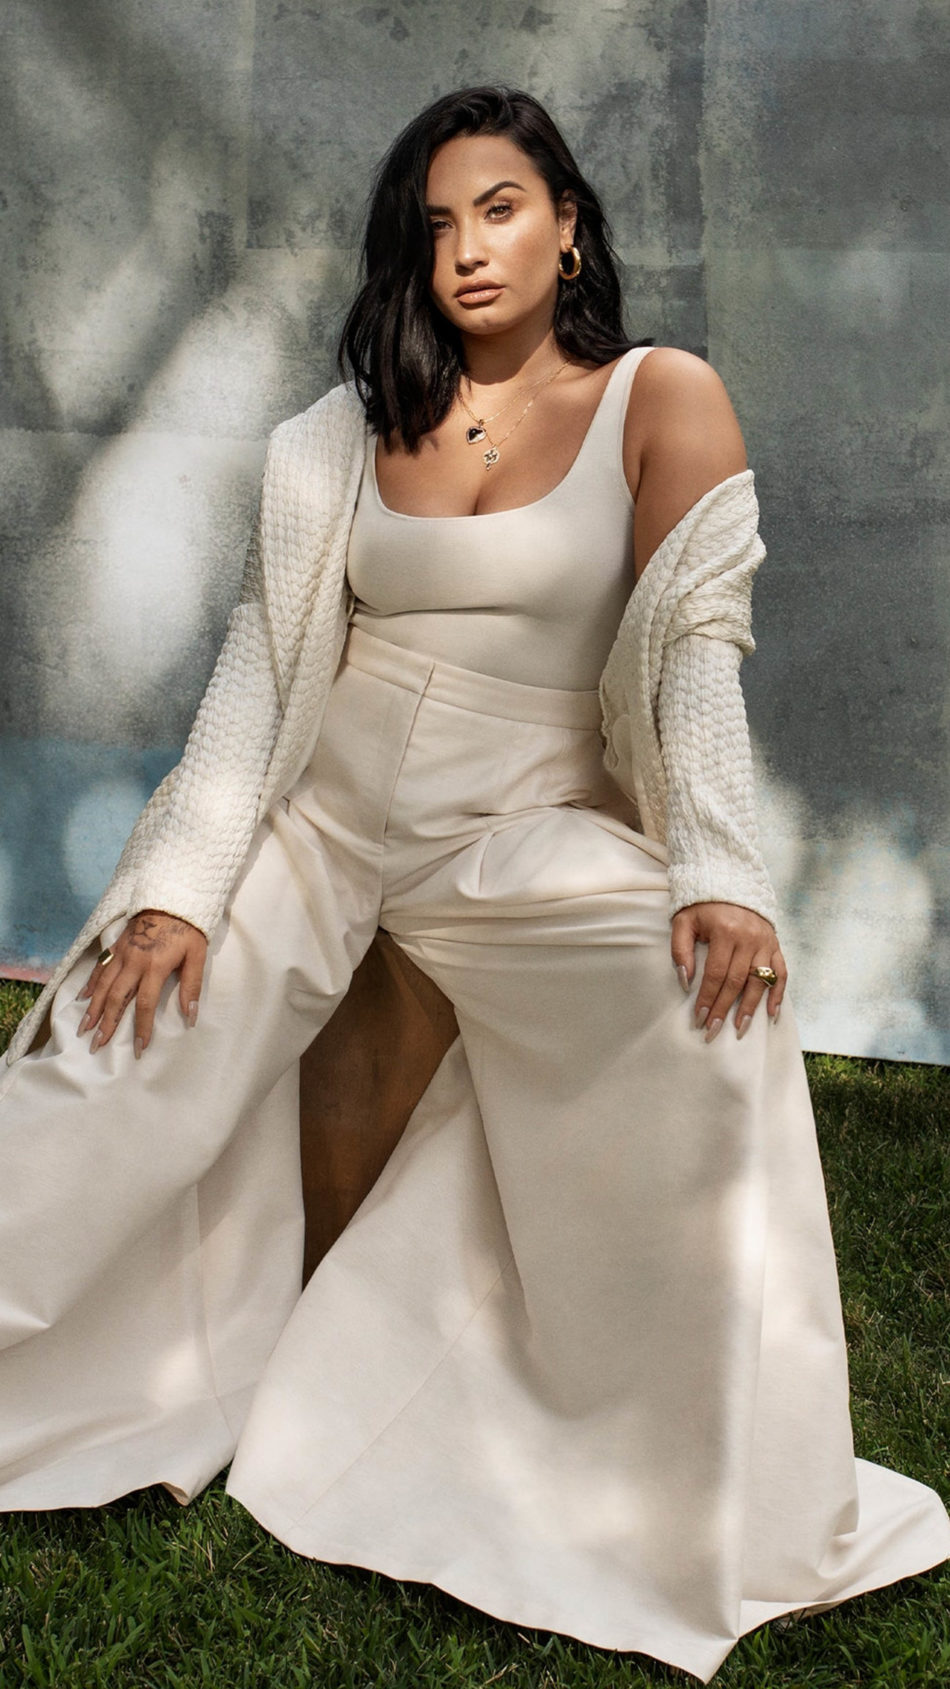 Demi Lovato 2020 4K Ultra HD Mobile Wallpaper